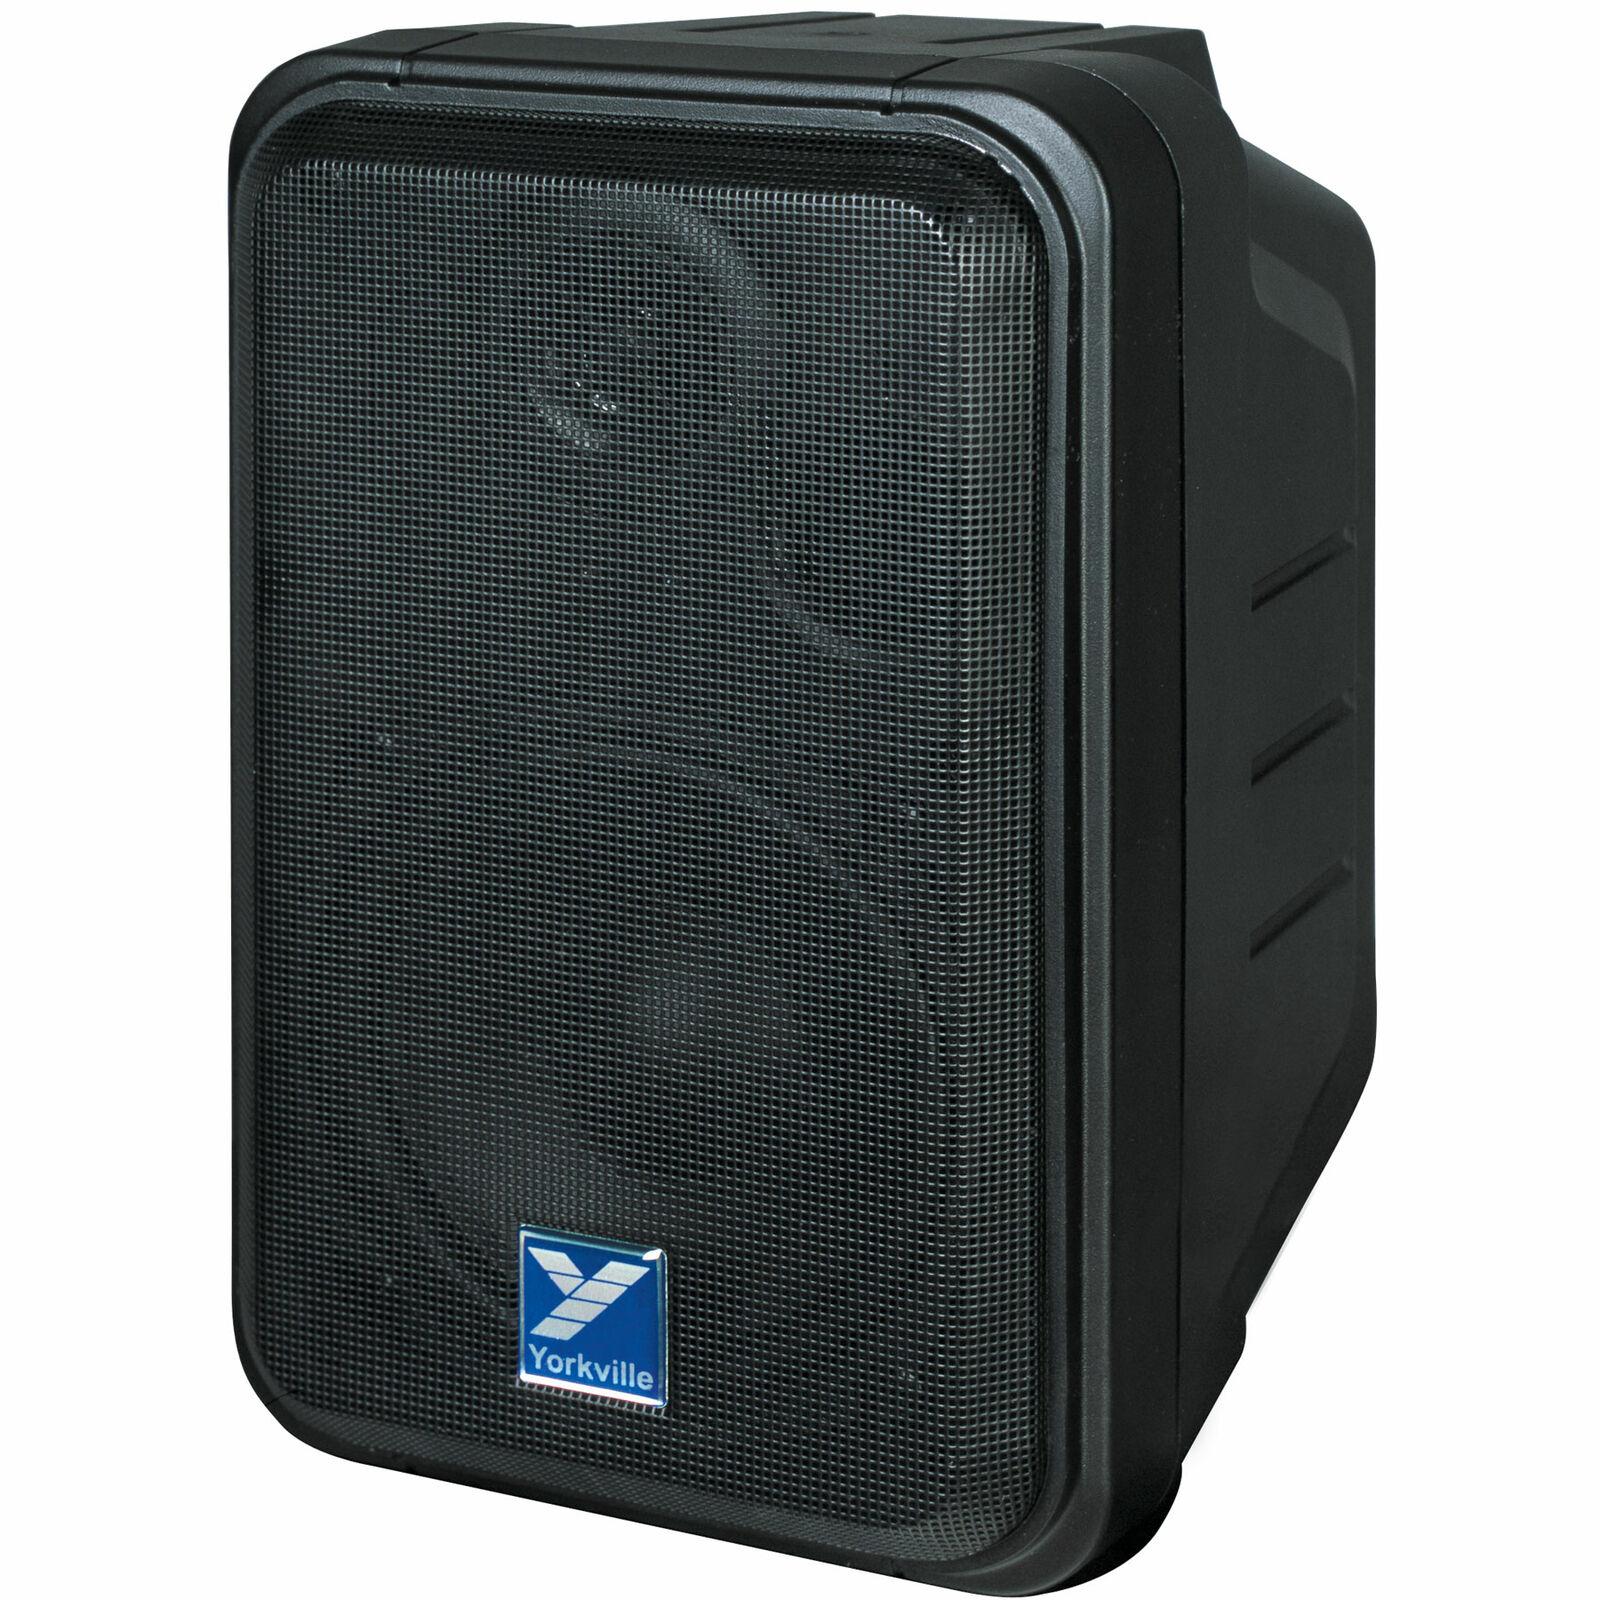 Yorkville C120 70 Coliseum Mini Series 5  2-Way Weather Resistant Passive Speake